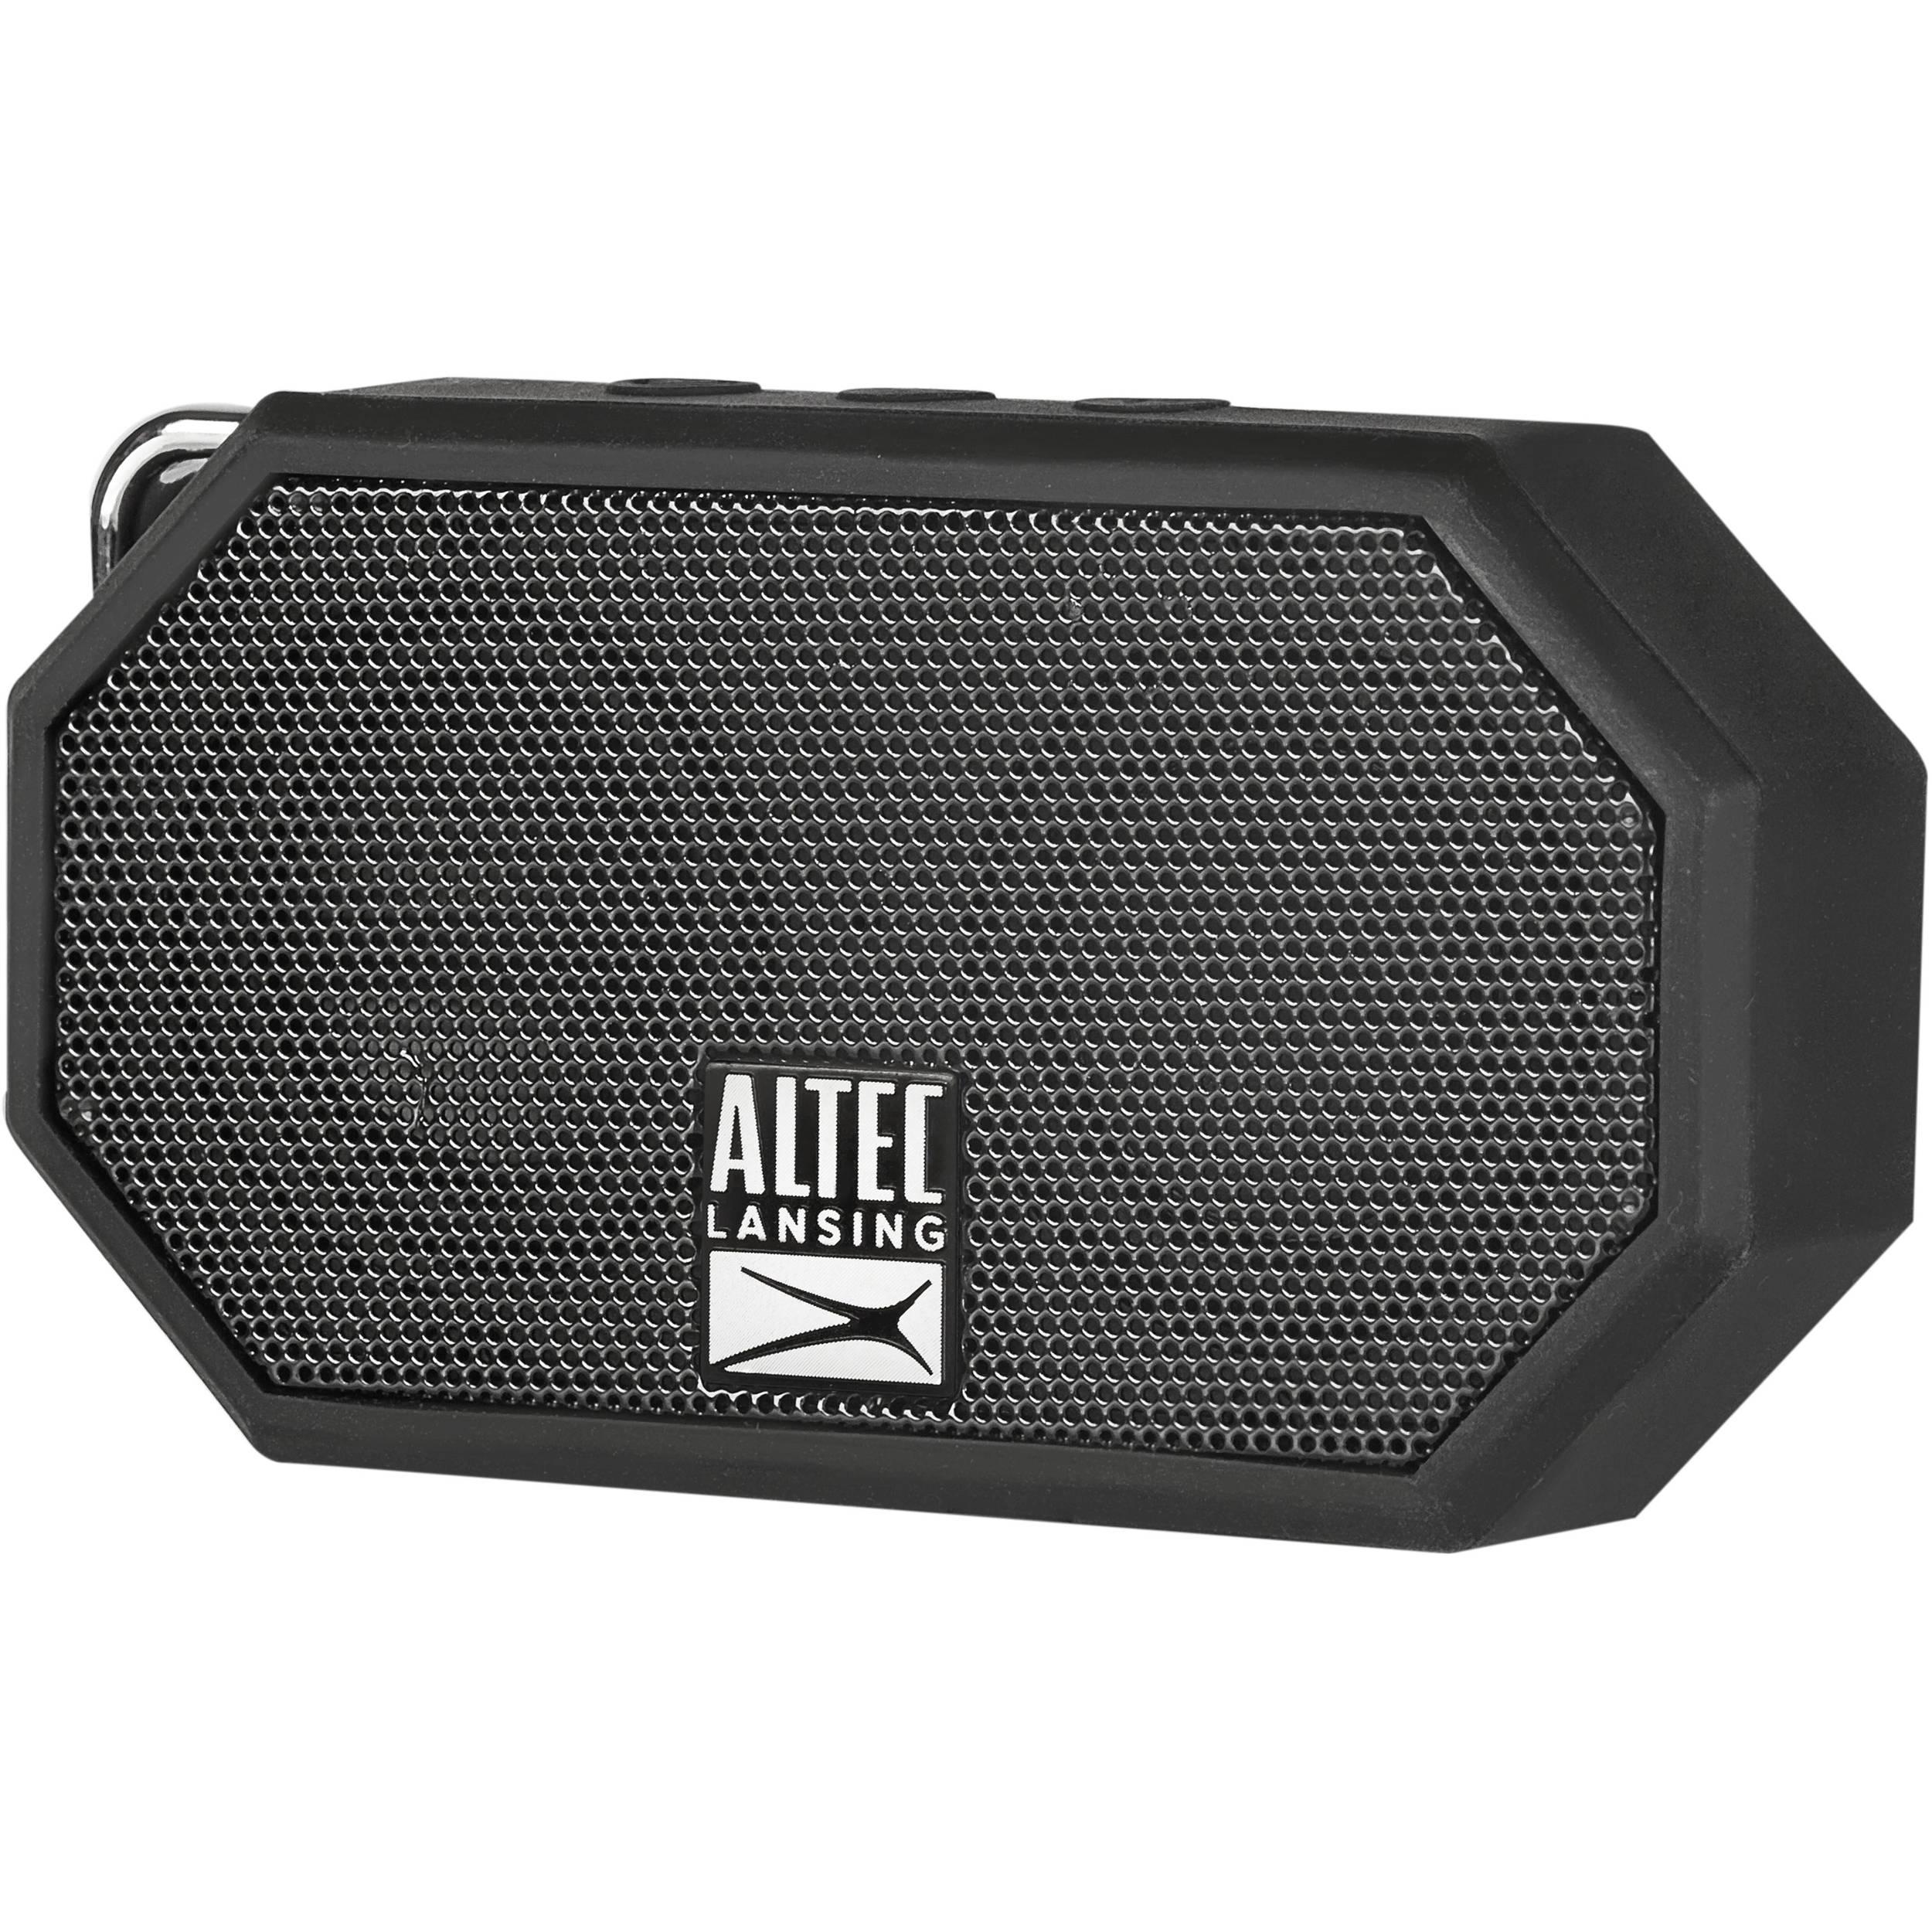 altec lansing mini h2o 2 bluetooth wireless speaker imw258 blk